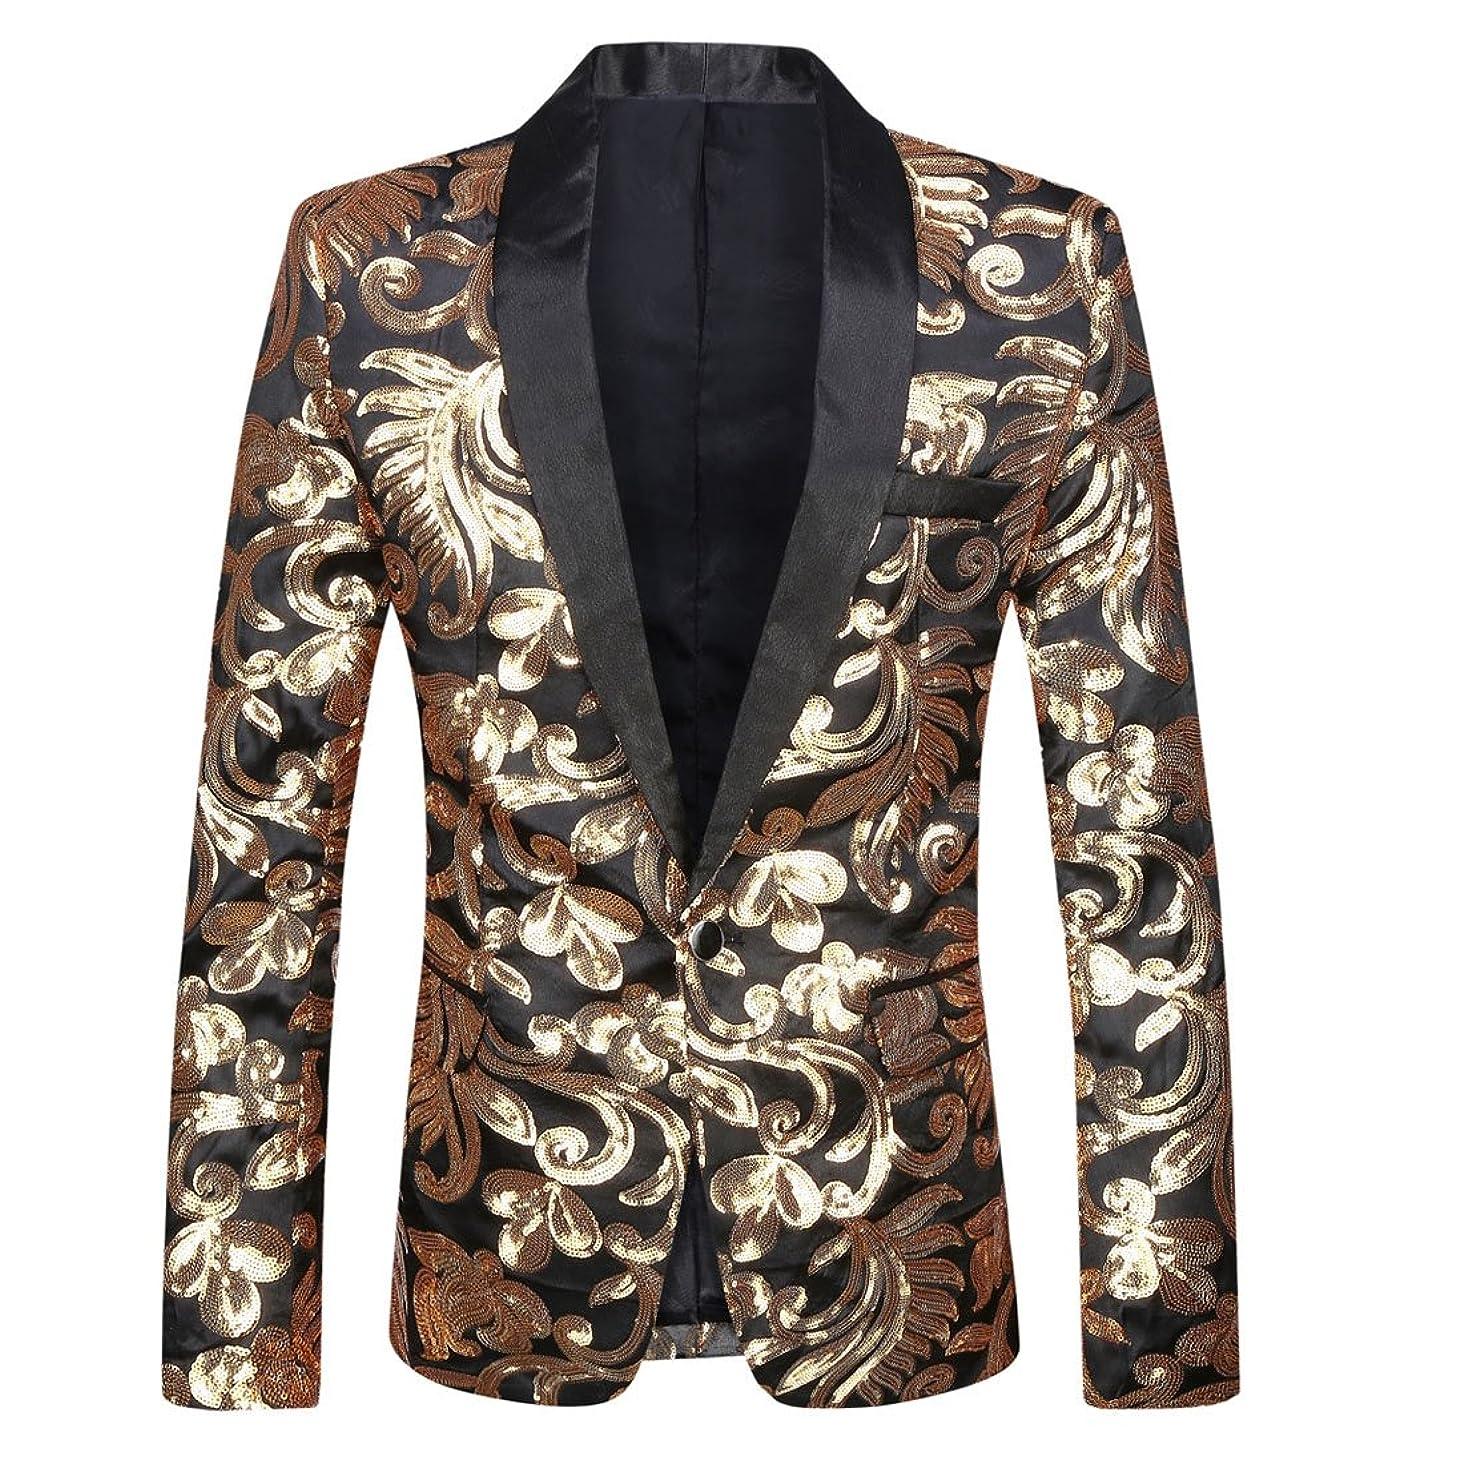 PYJTRL Men Stylish Satin Face Sequins Floral Pattern Suit Jacket Blazer